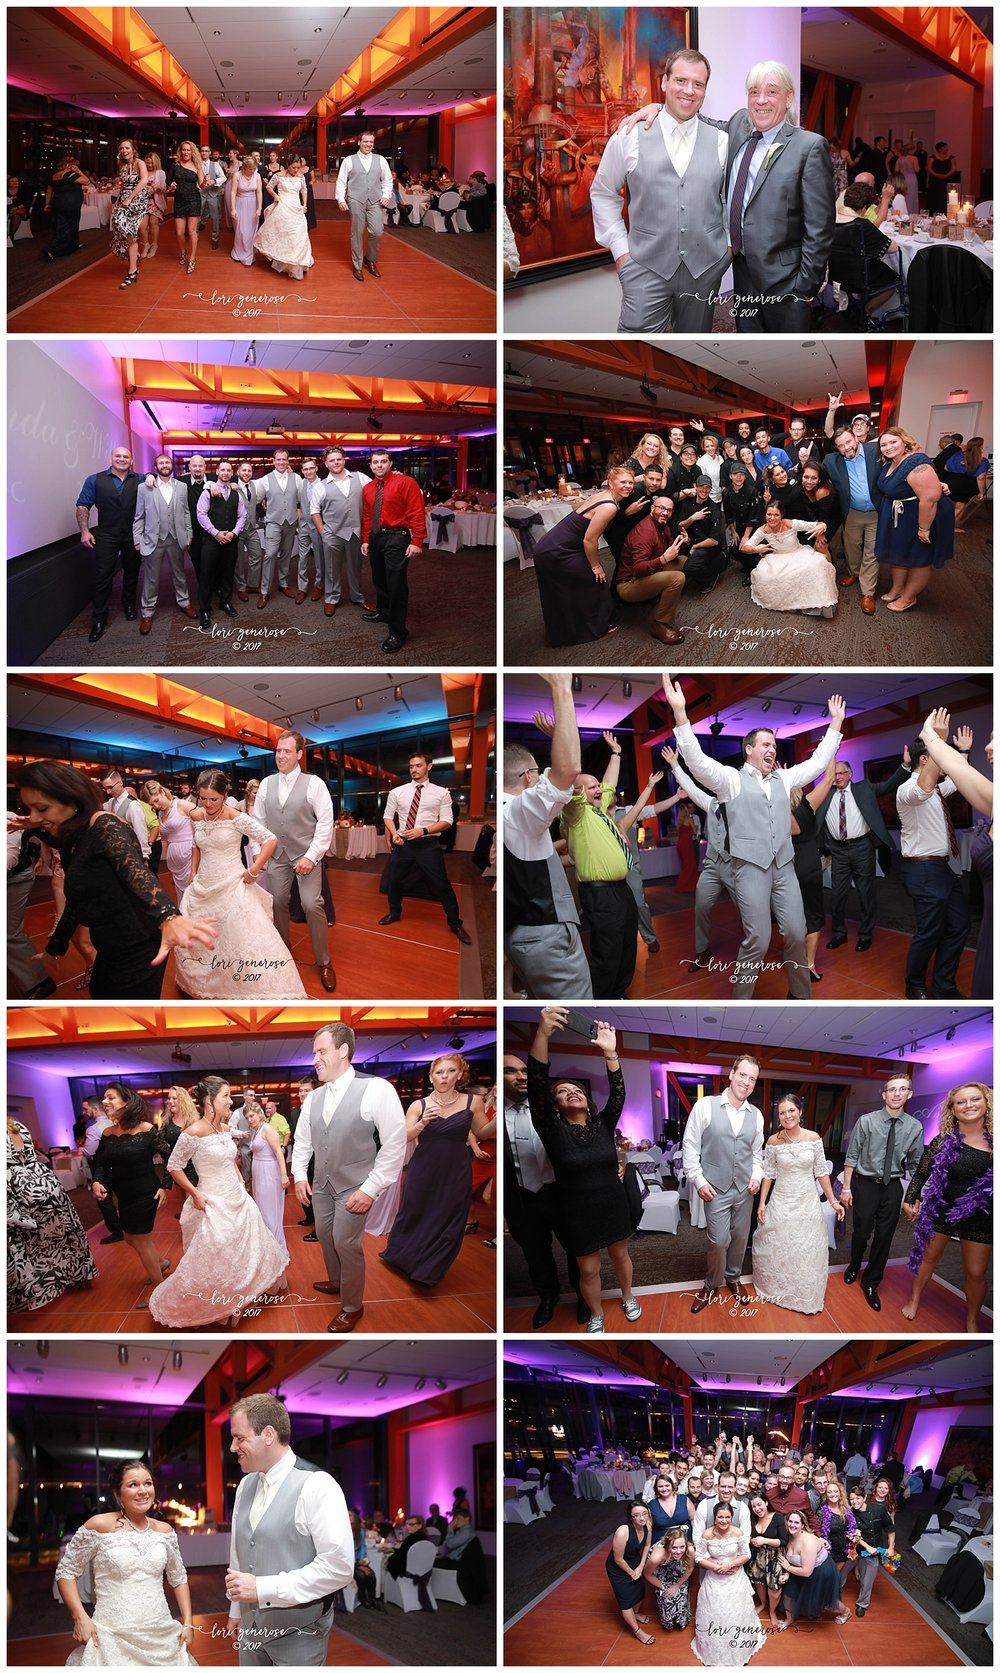 weddingreceptiondancingfallweddingatsteelstacksbethlehempaweddingvenue.jpg